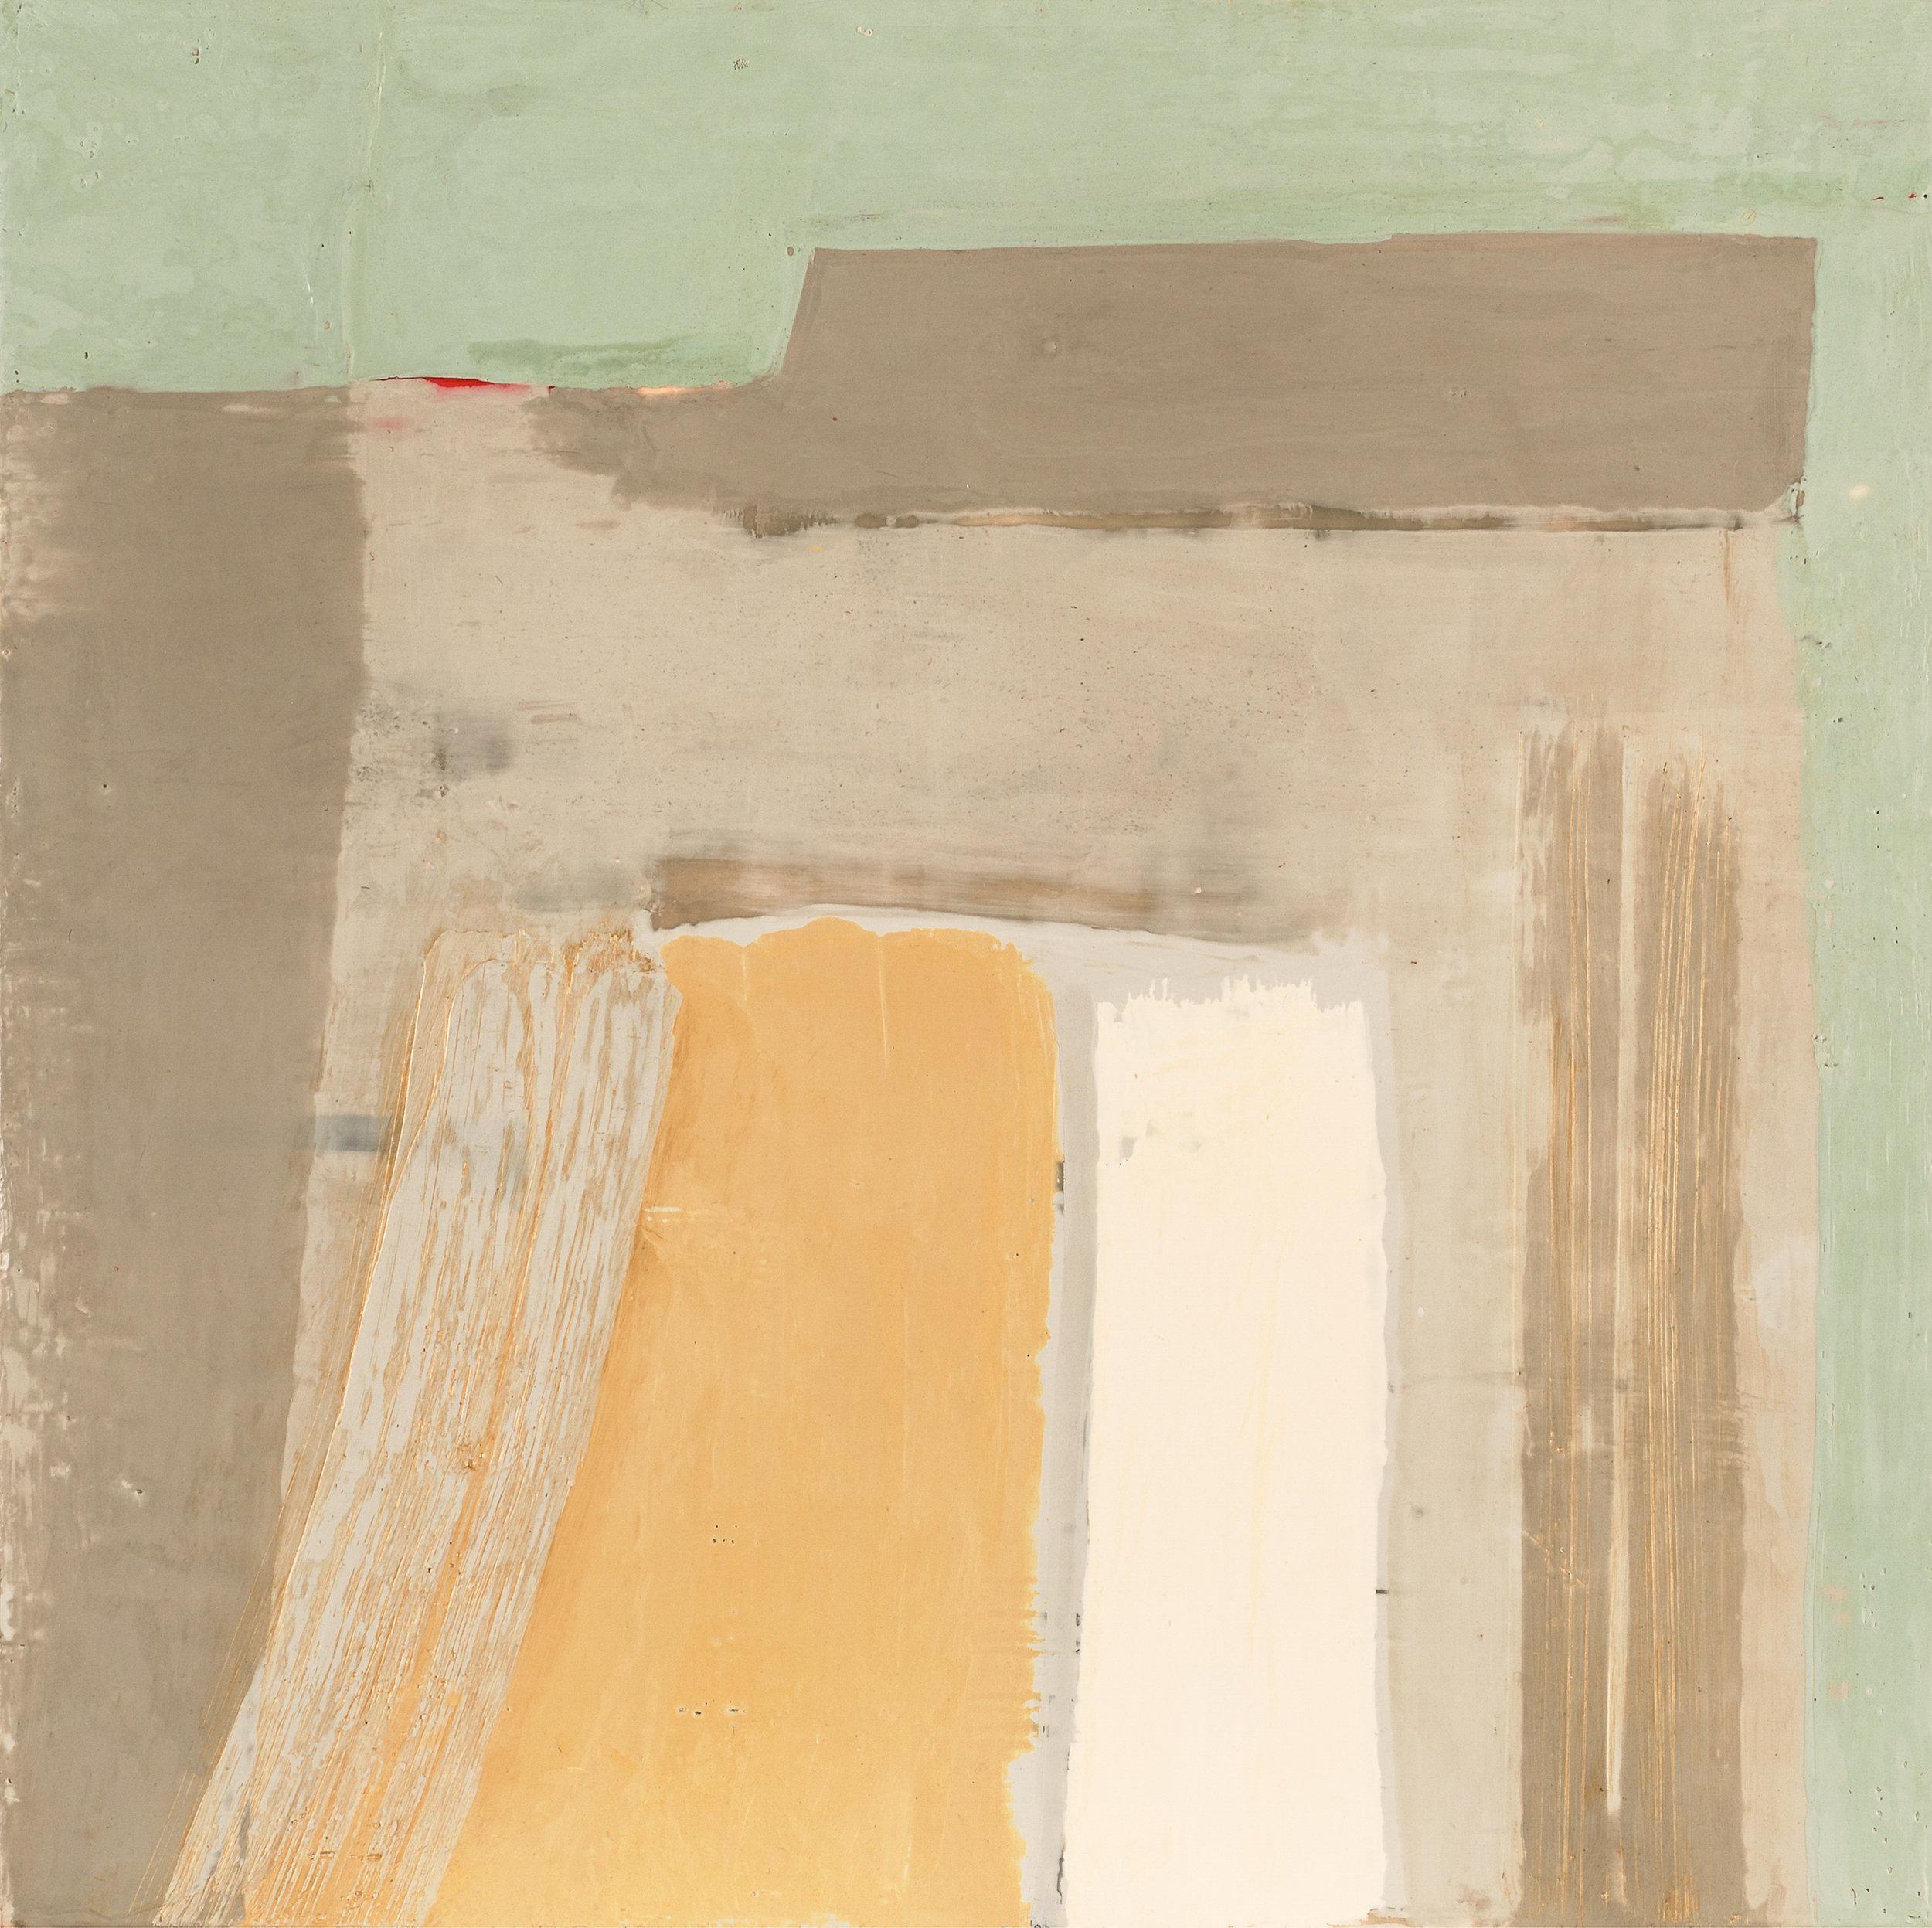 Untitled 3, Encaustic on Birch Panel, 18x18, 2016